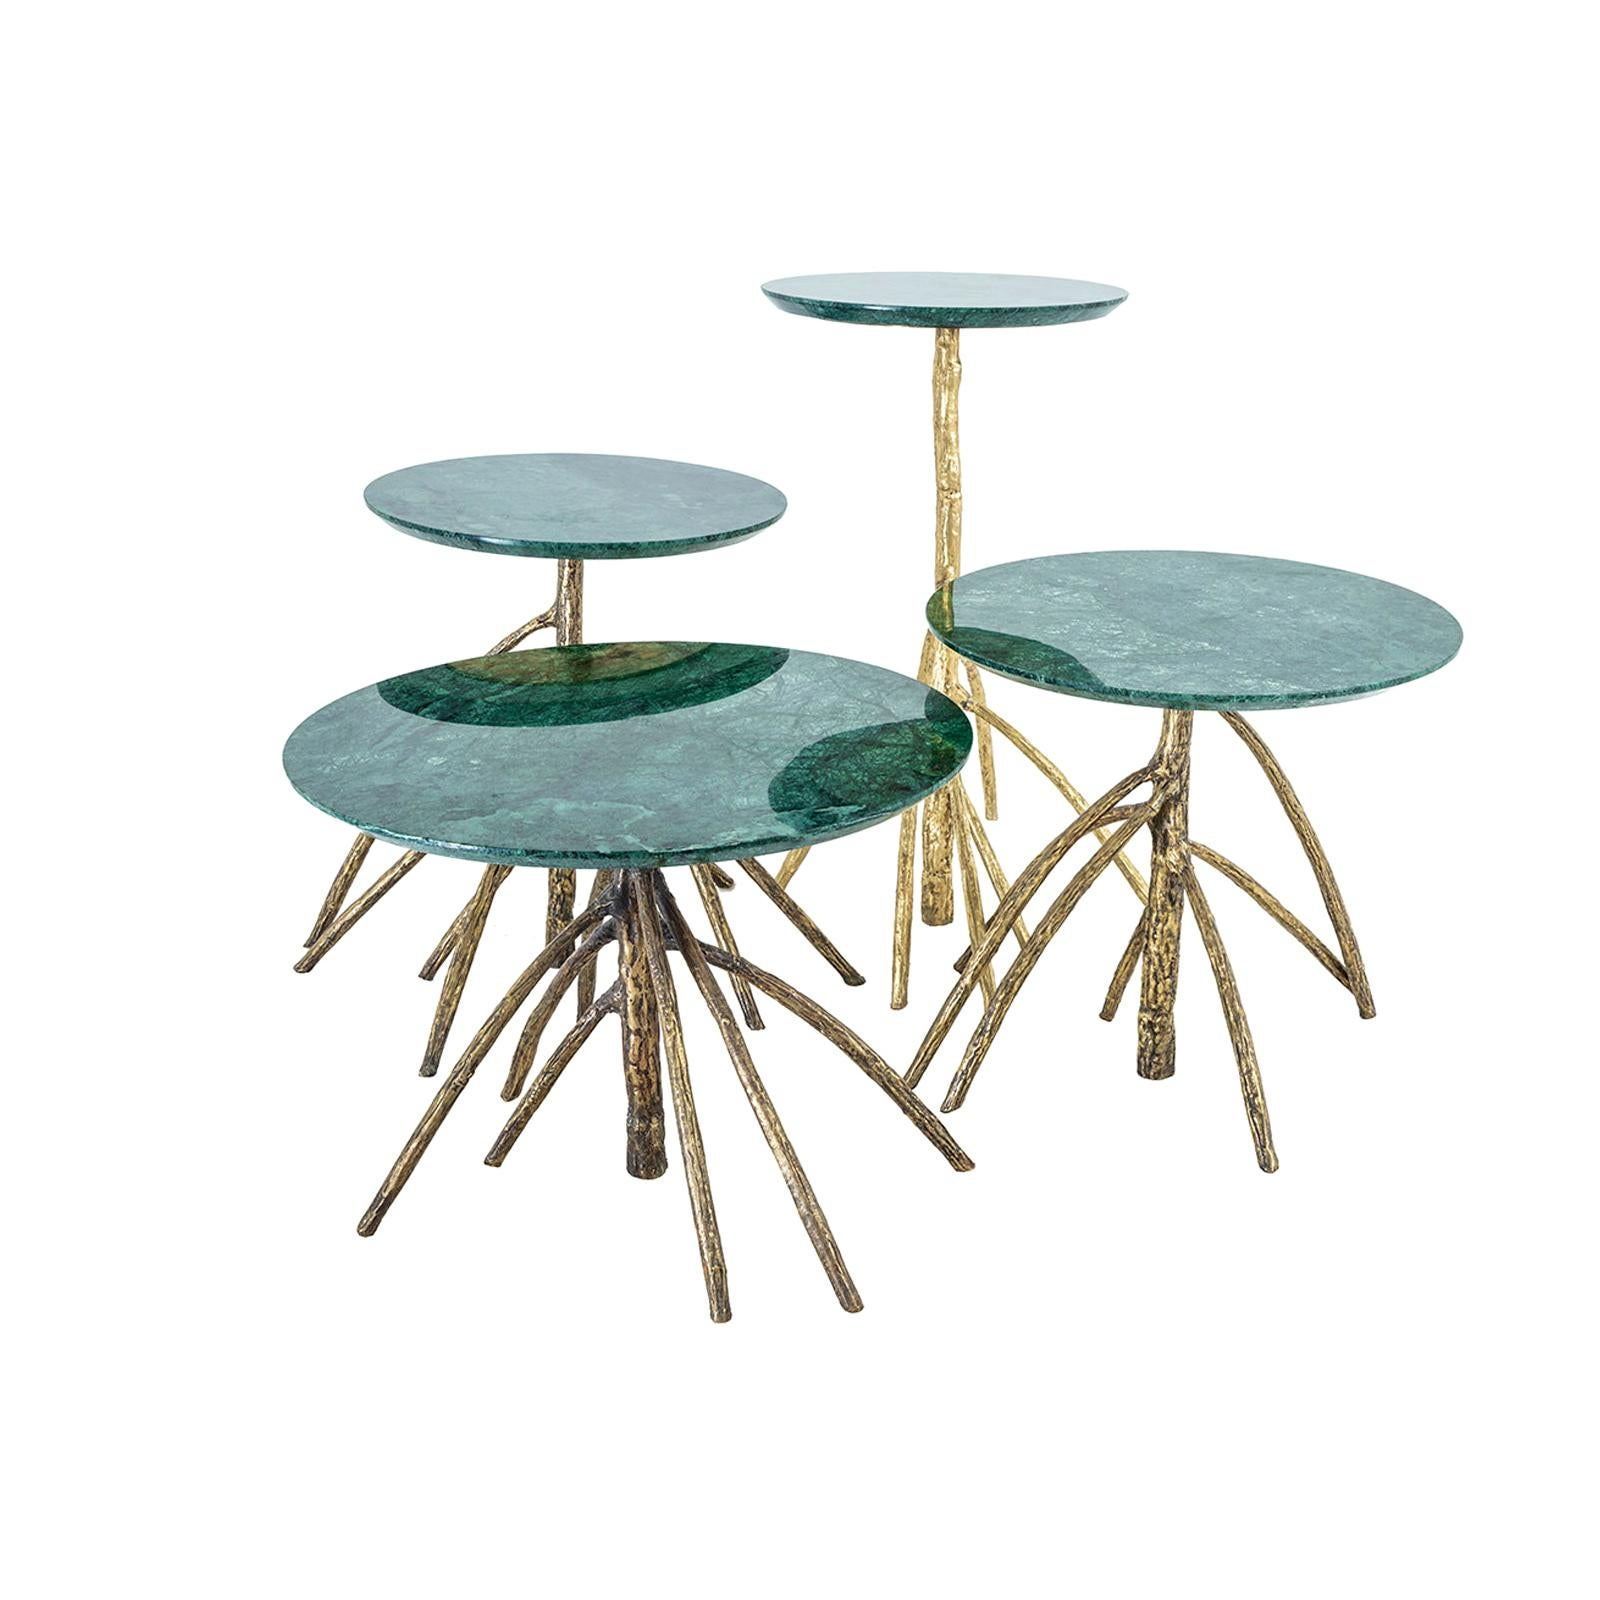 Rossana Orlandi Mangrovia Low Table Set Bronze by Francesco Messina for Cypraea